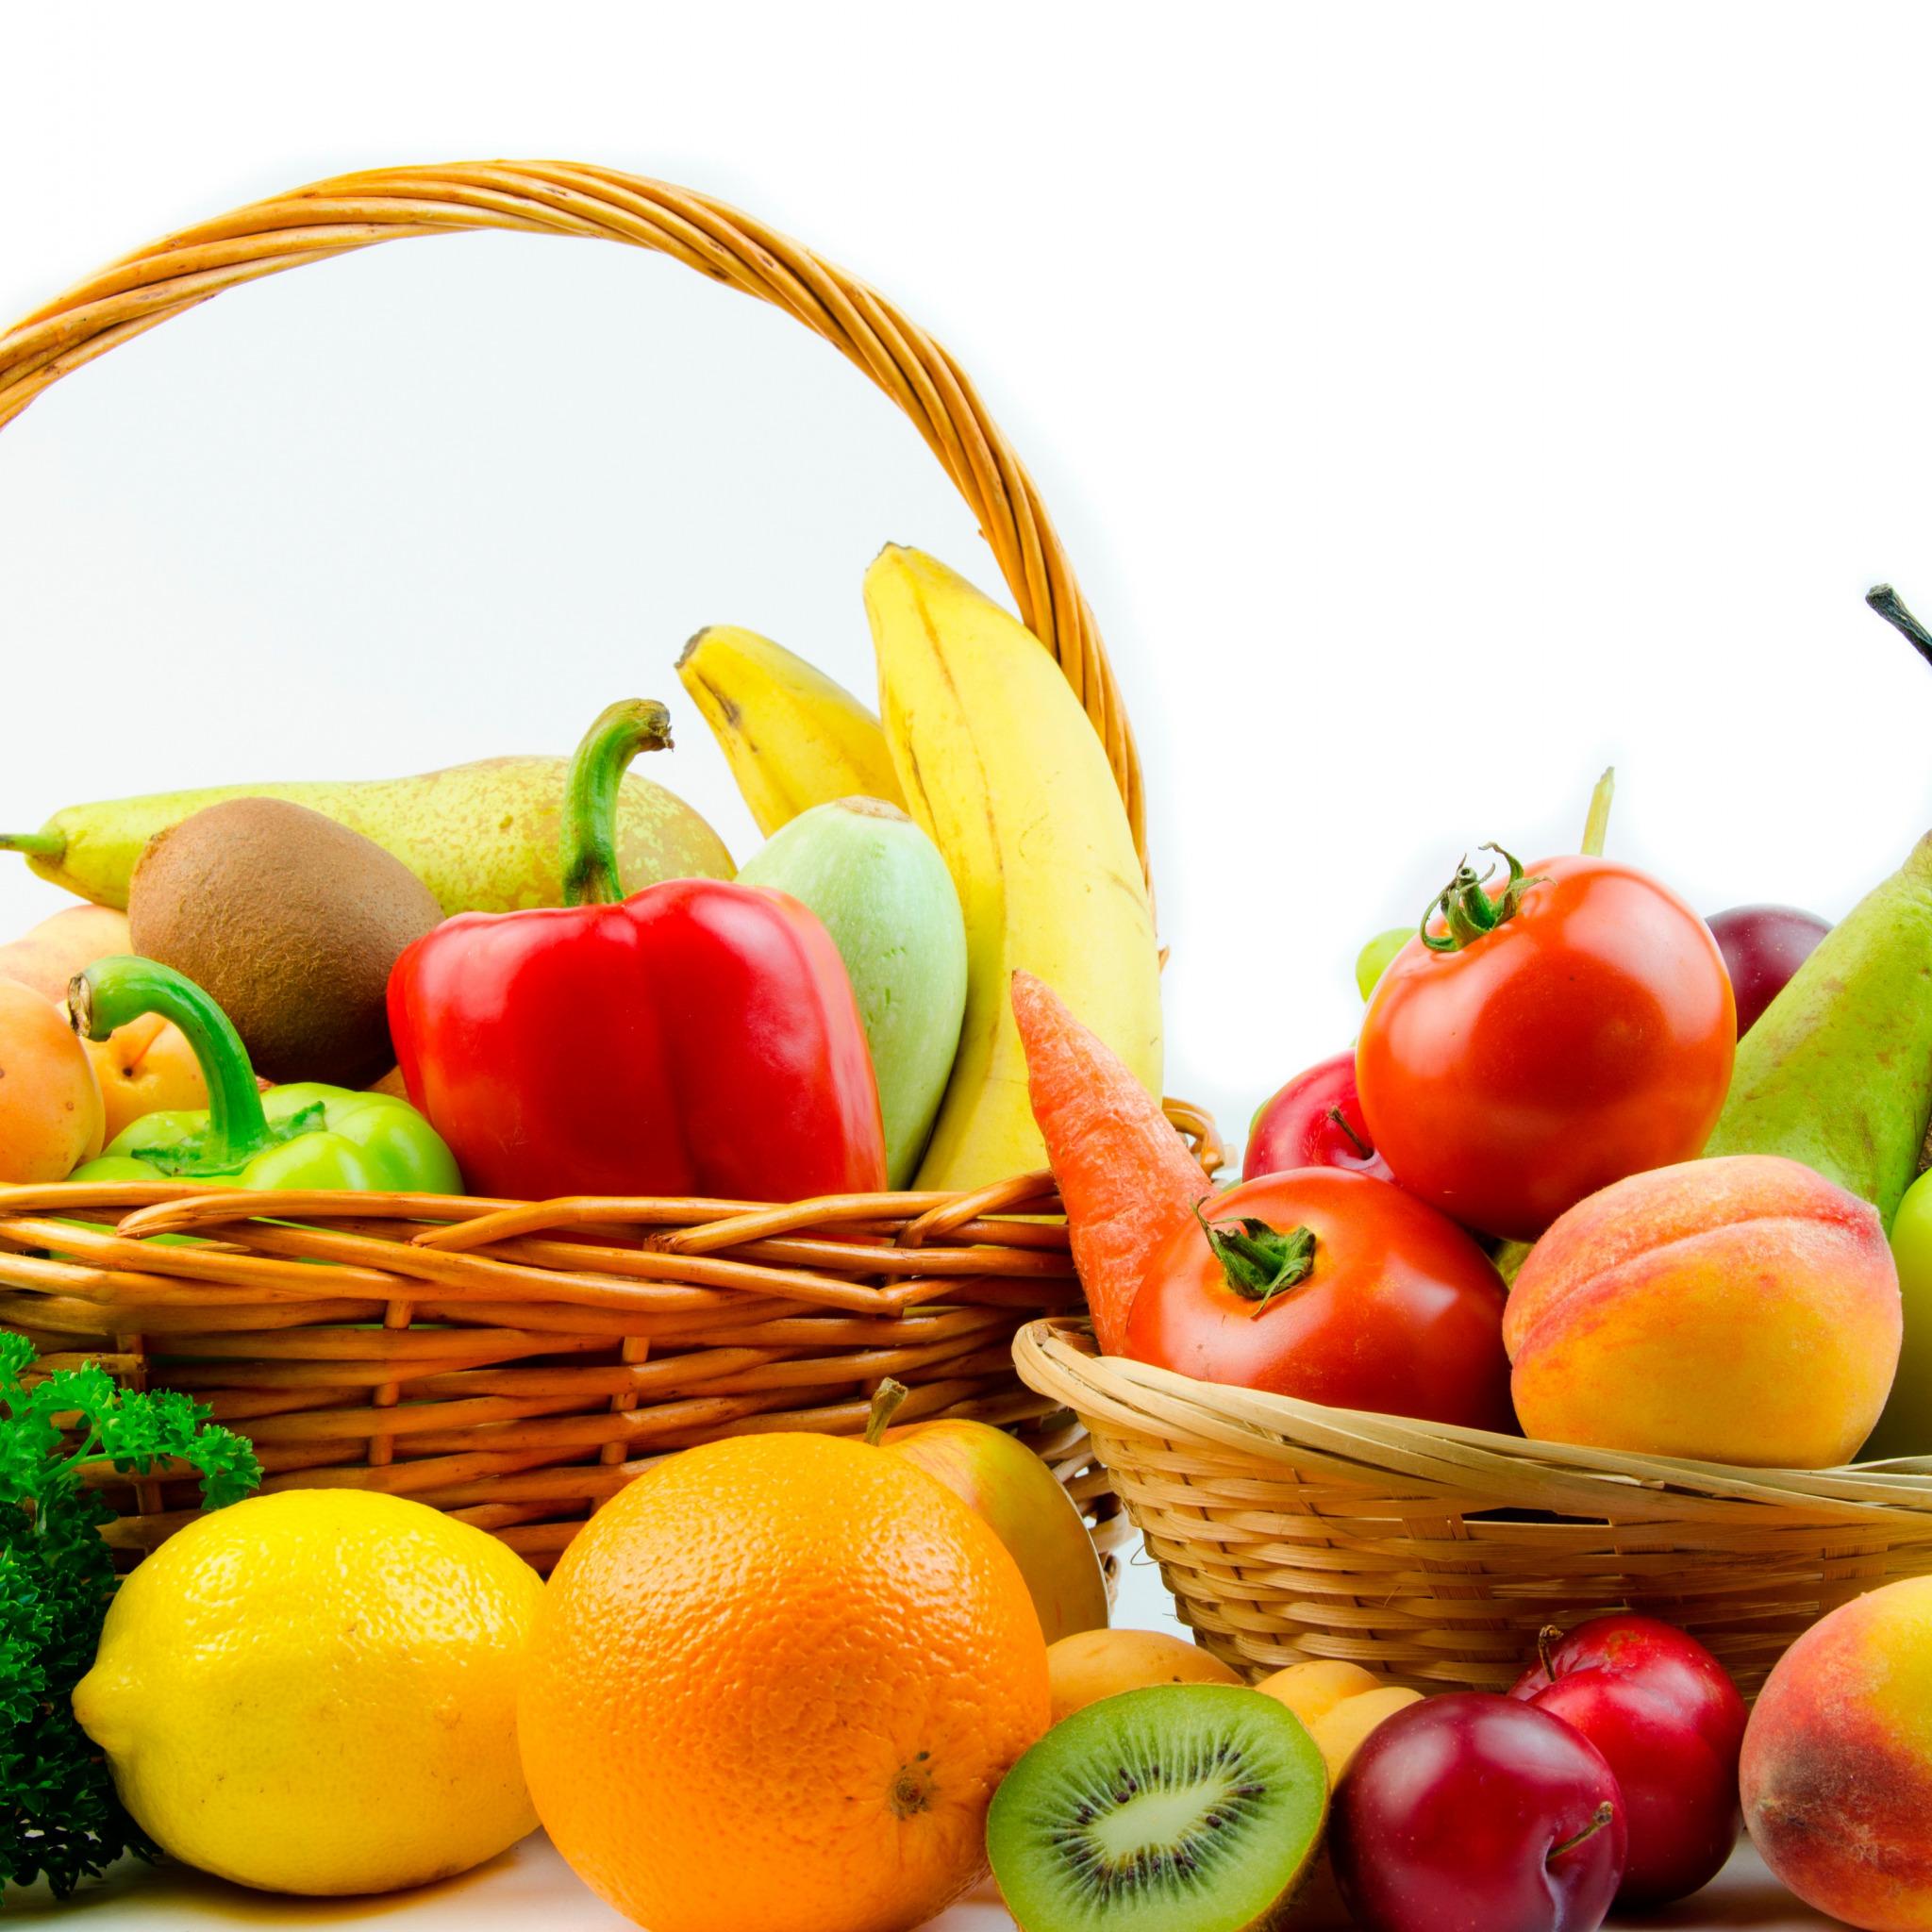 Картинки фрукты овощи на белом фоне